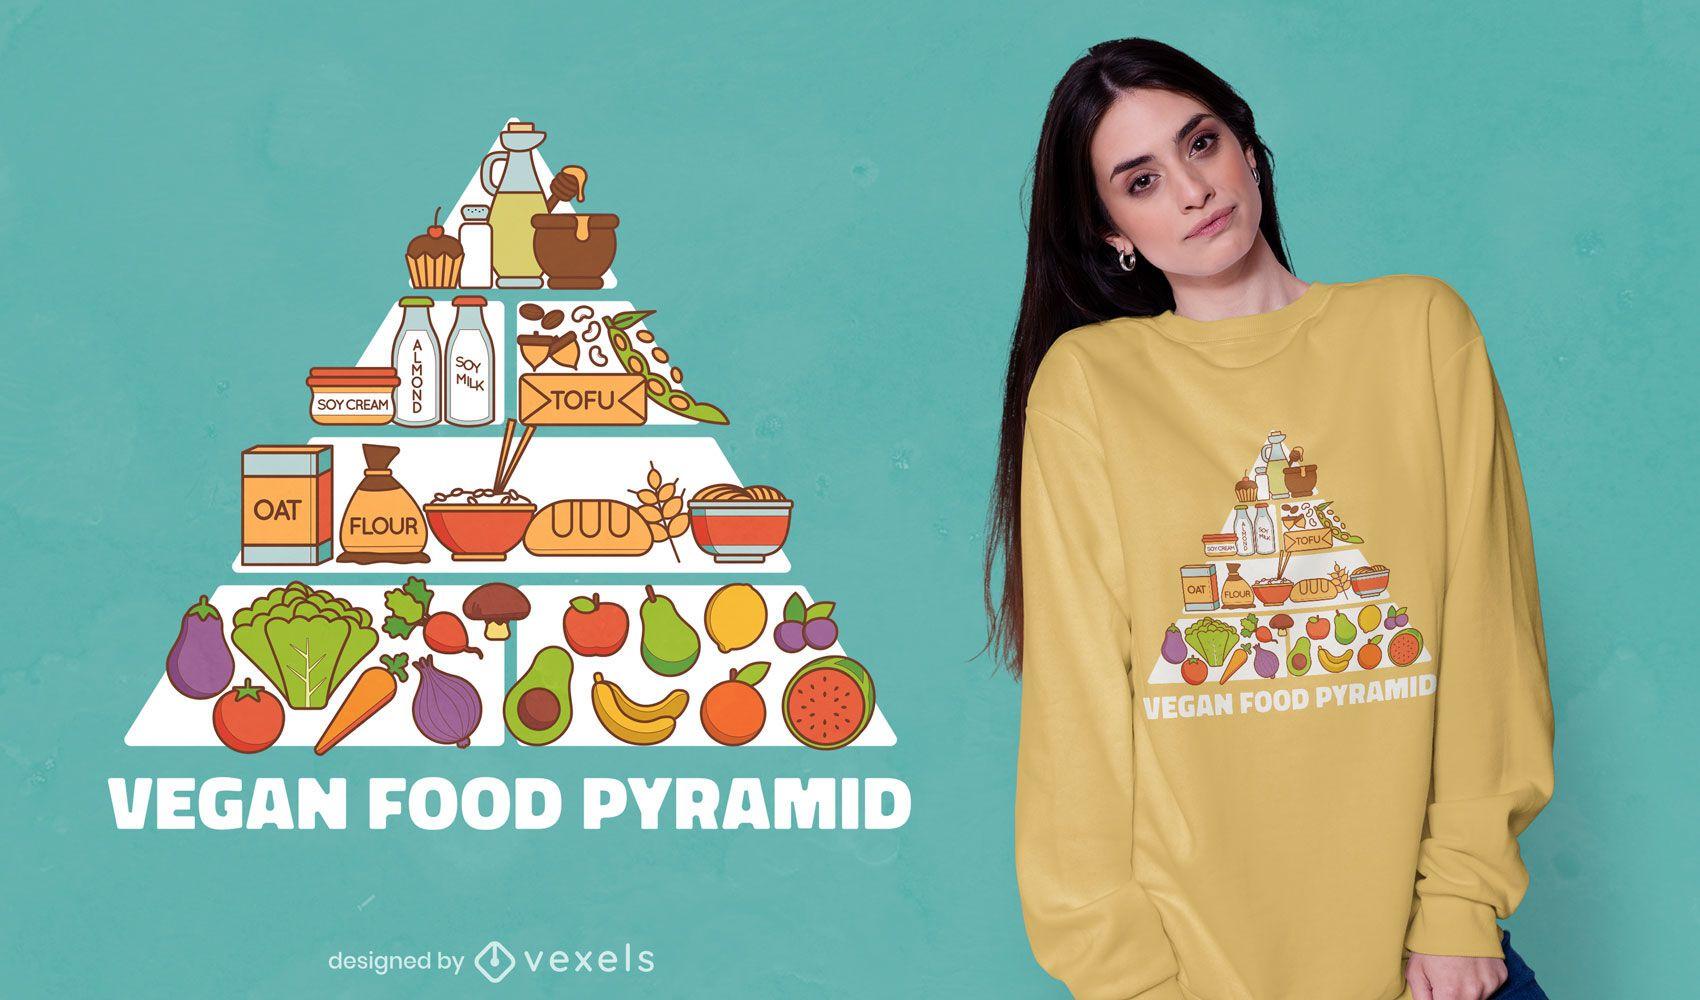 Vegan food pyramid t-shirt design